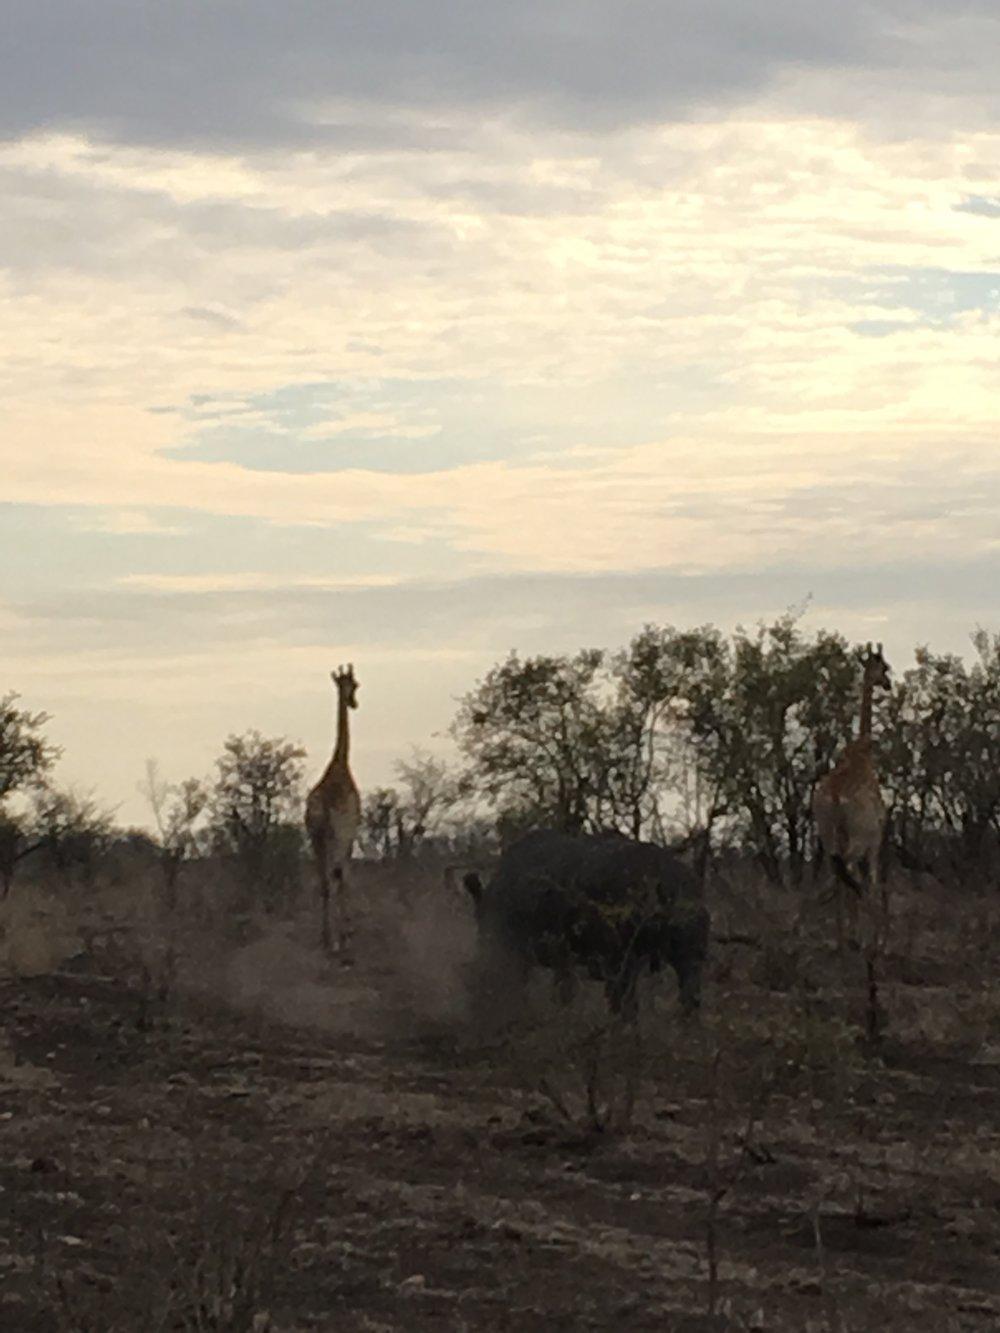 Rhino & Giraffe